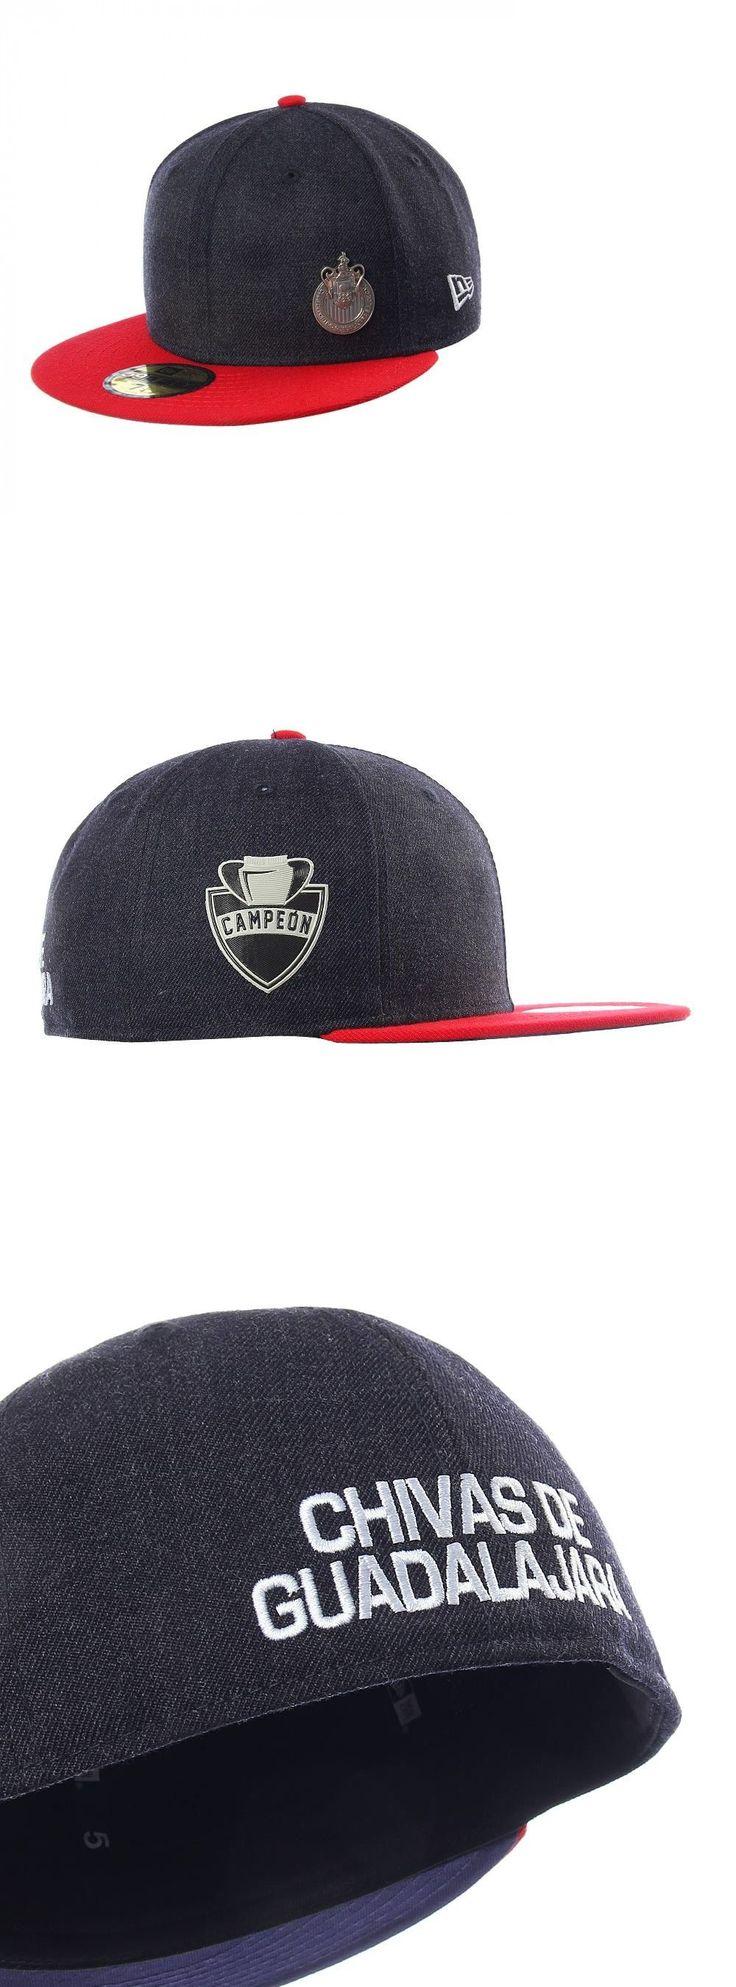 Hats and Headwear 123876: Chivas De Guadalajara 59Fifty Official Campeon Copa Mx New Era Hat America Atlas -> BUY IT NOW ONLY: $59.99 on eBay!